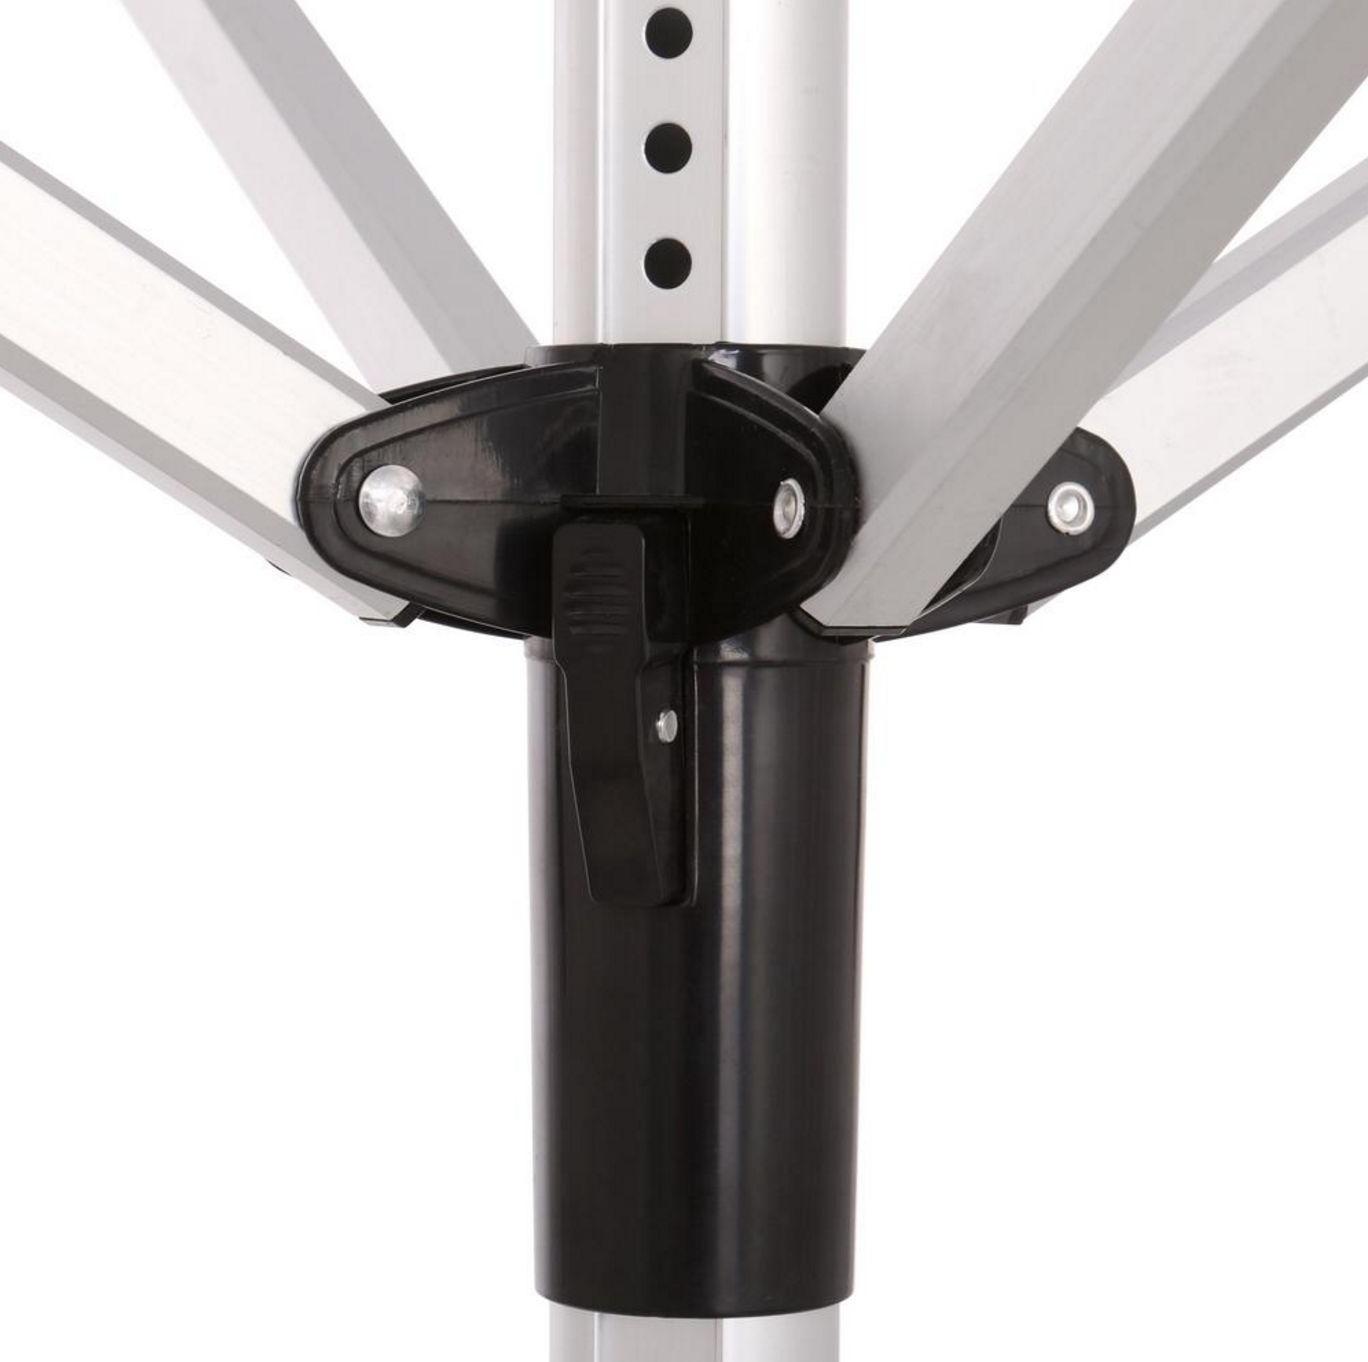 Outdoor Clothes Rack Umbrella Clothesline Adjustable Height Laundry Line